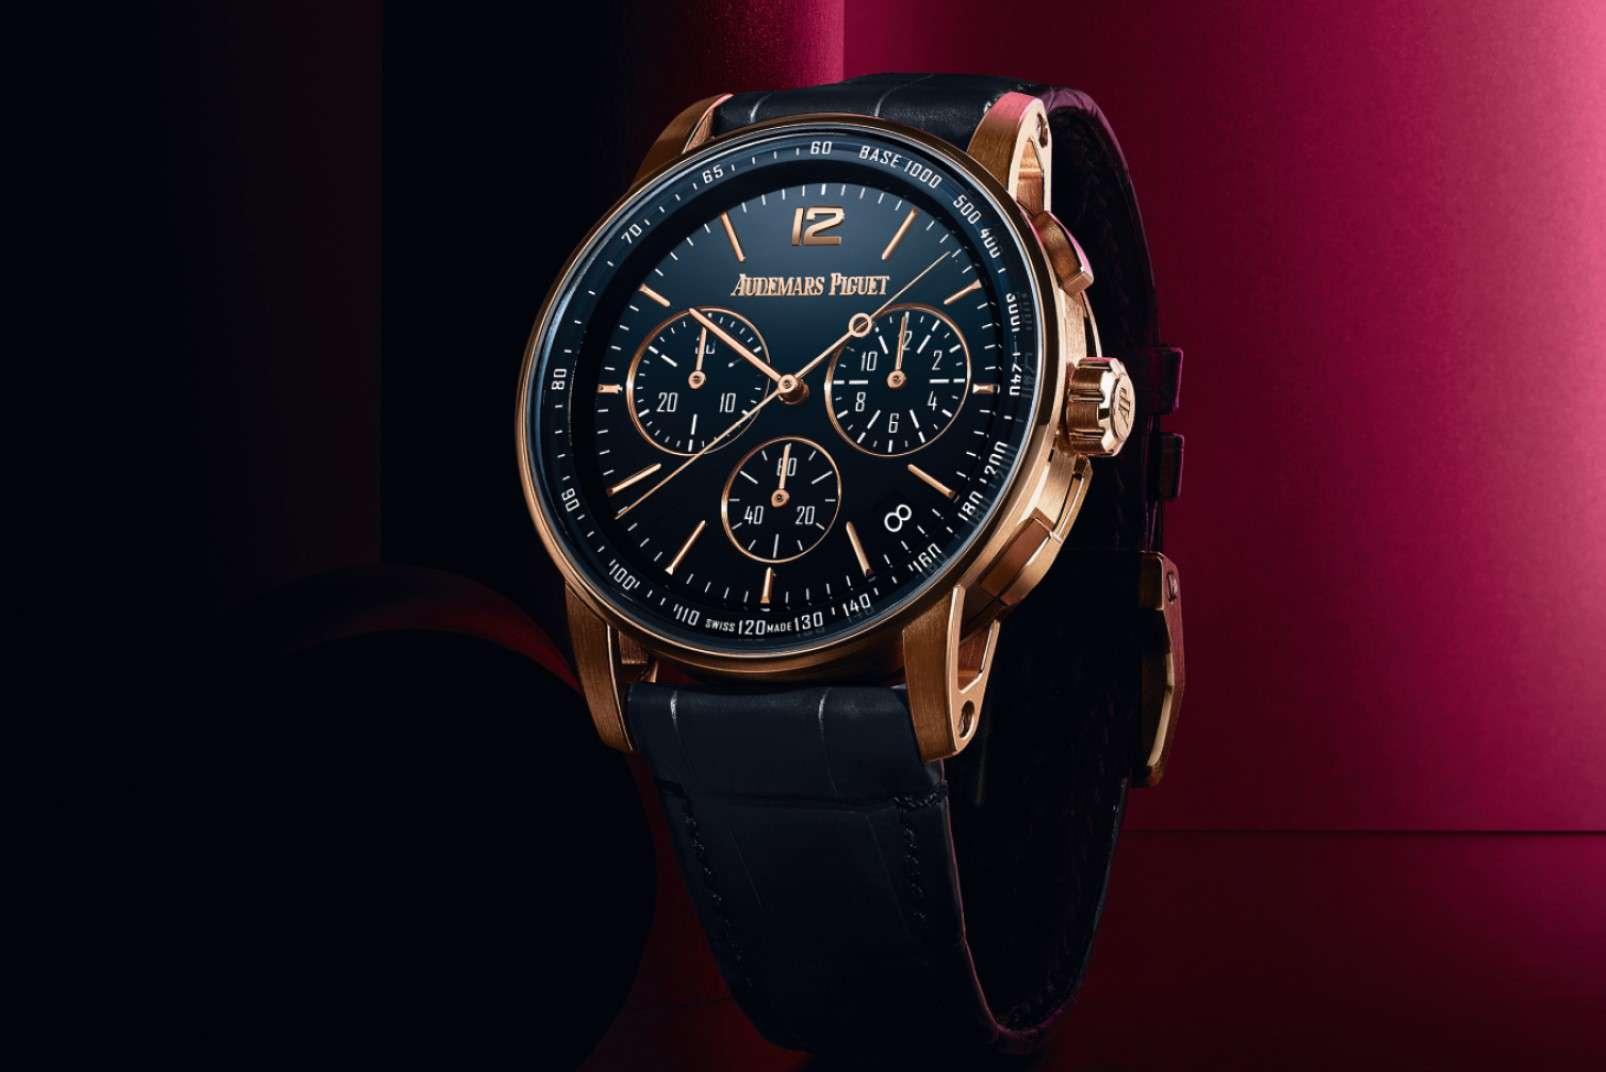 Audemars Piguet Code 11.59 Automatic Chronograph - SIHH 2019